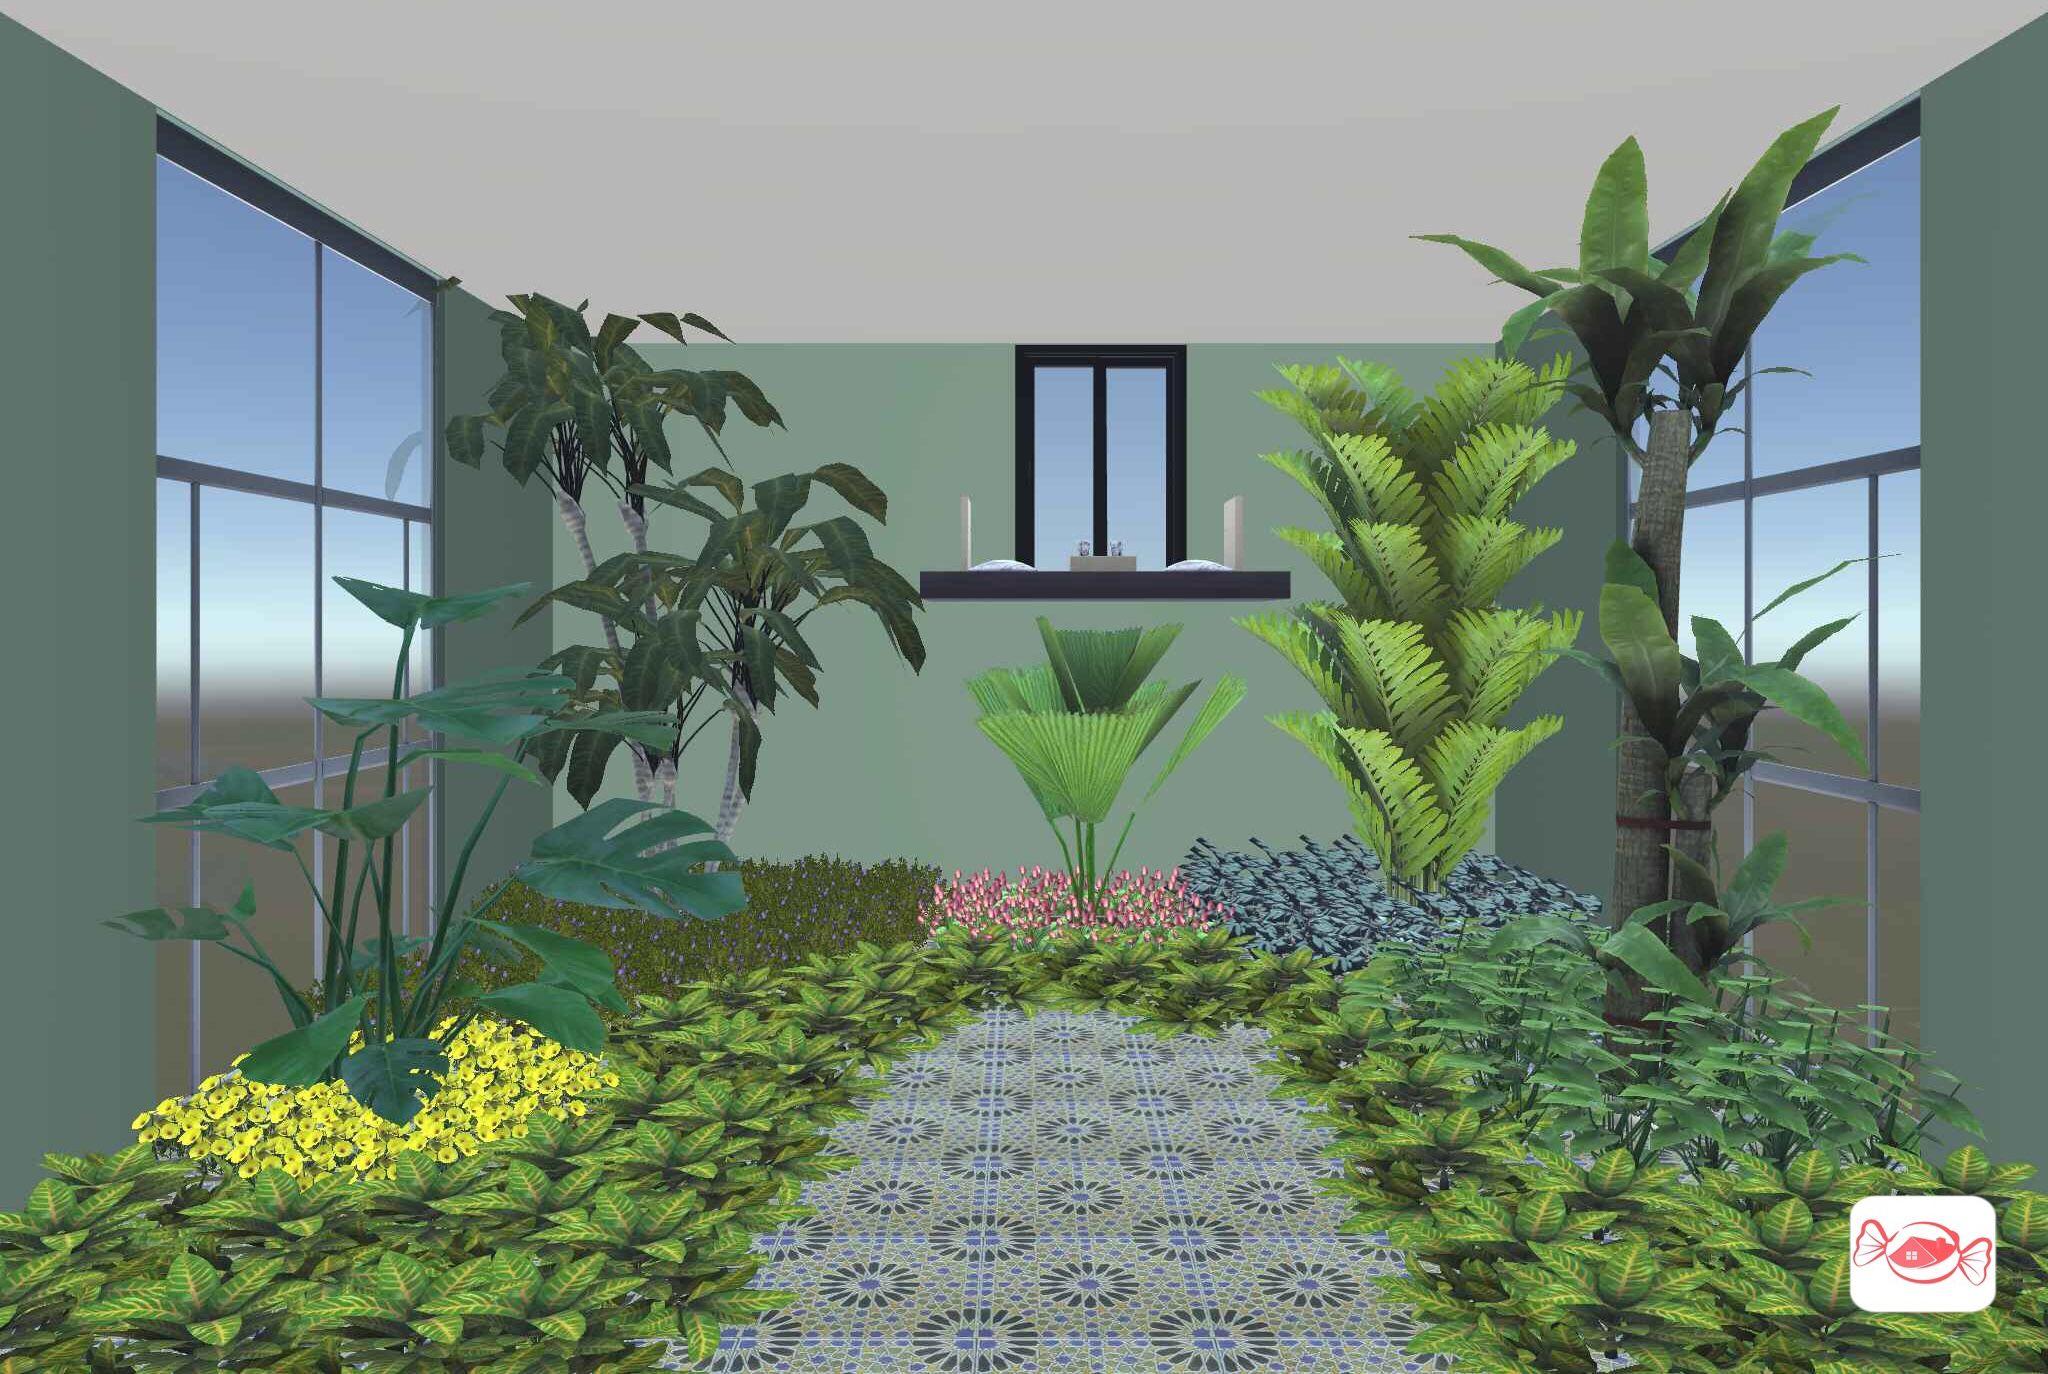 Indoor Garden Created With Home Sweet Home 3d App Indoor Garden Sweet Home Design